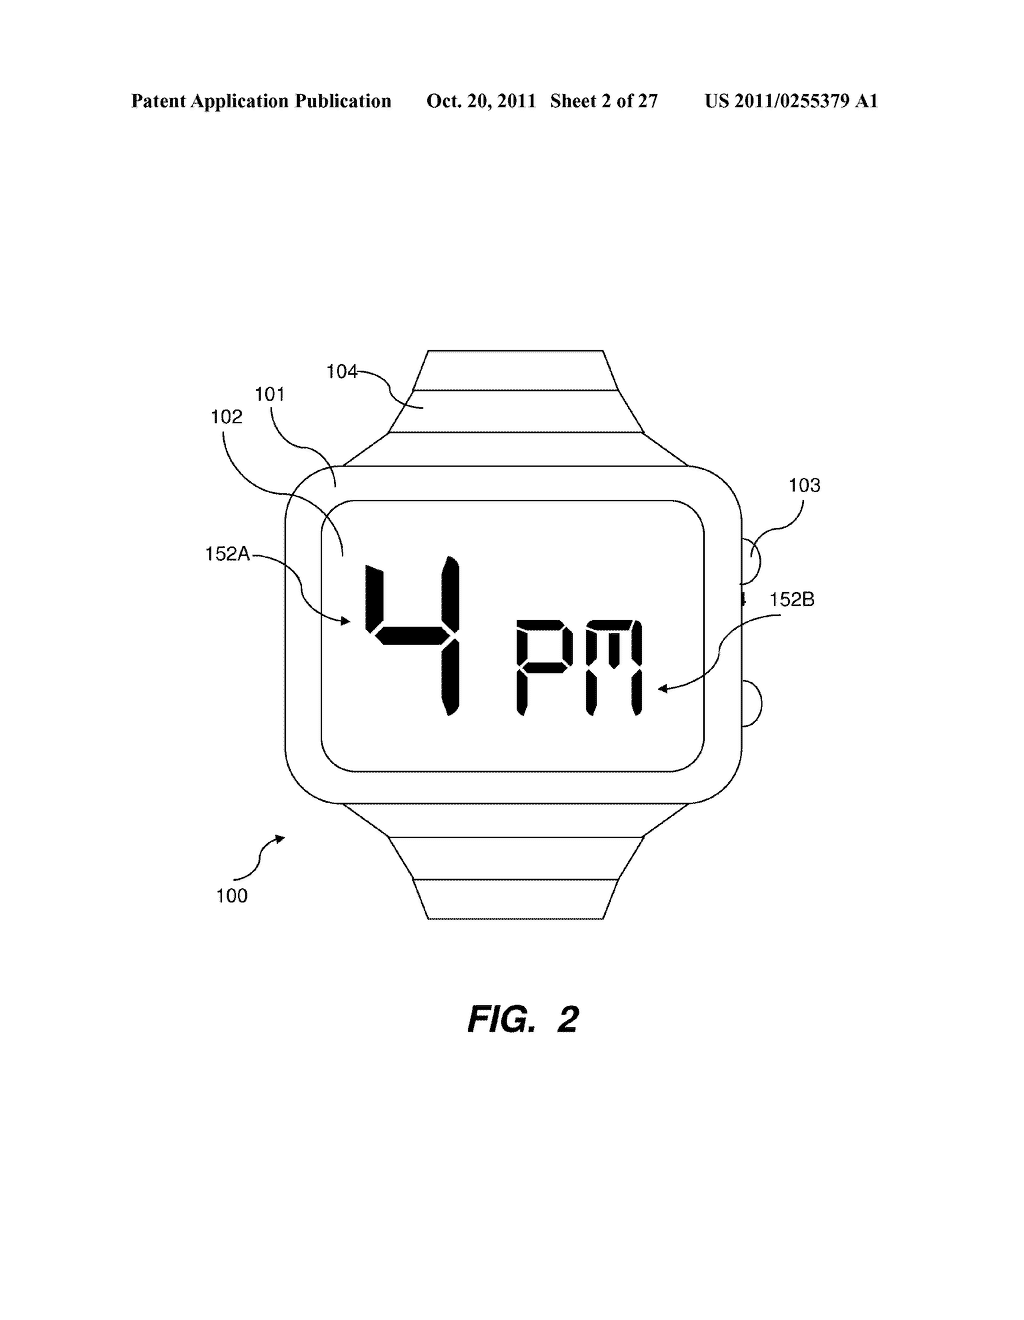 Circuit Diagram Of Digital Watch Modern Design Wiring Simple Voltmeter Wristwatch And Clock Rh Patentsencyclopedia Com Example